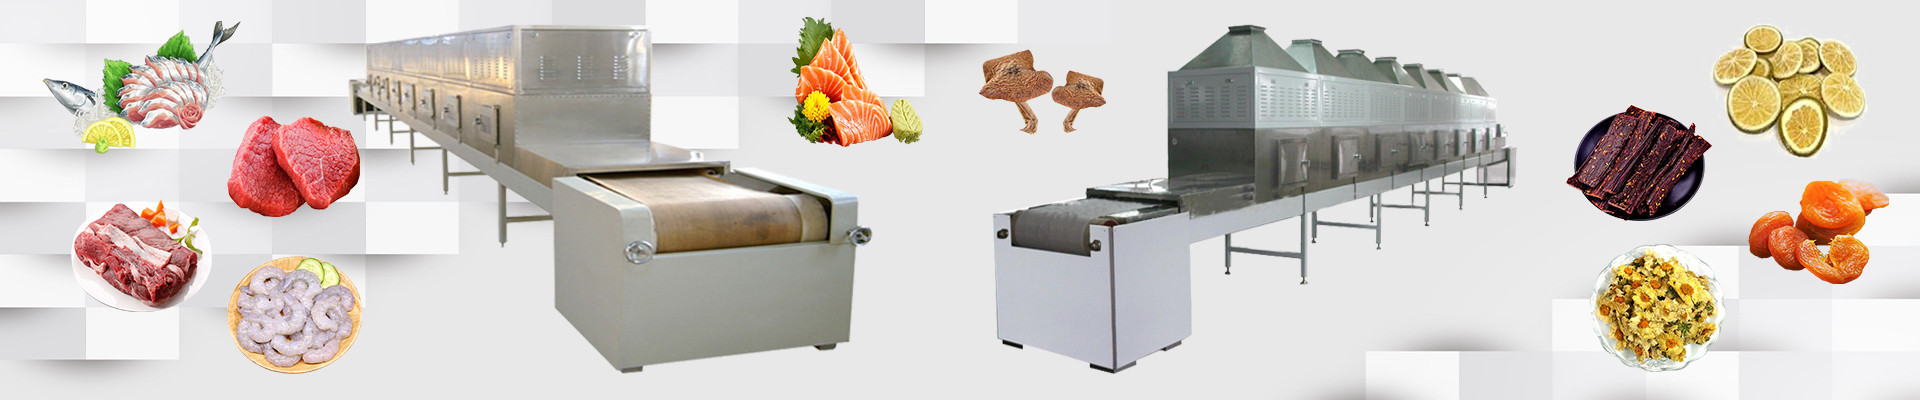 Industrial sterilization equipment